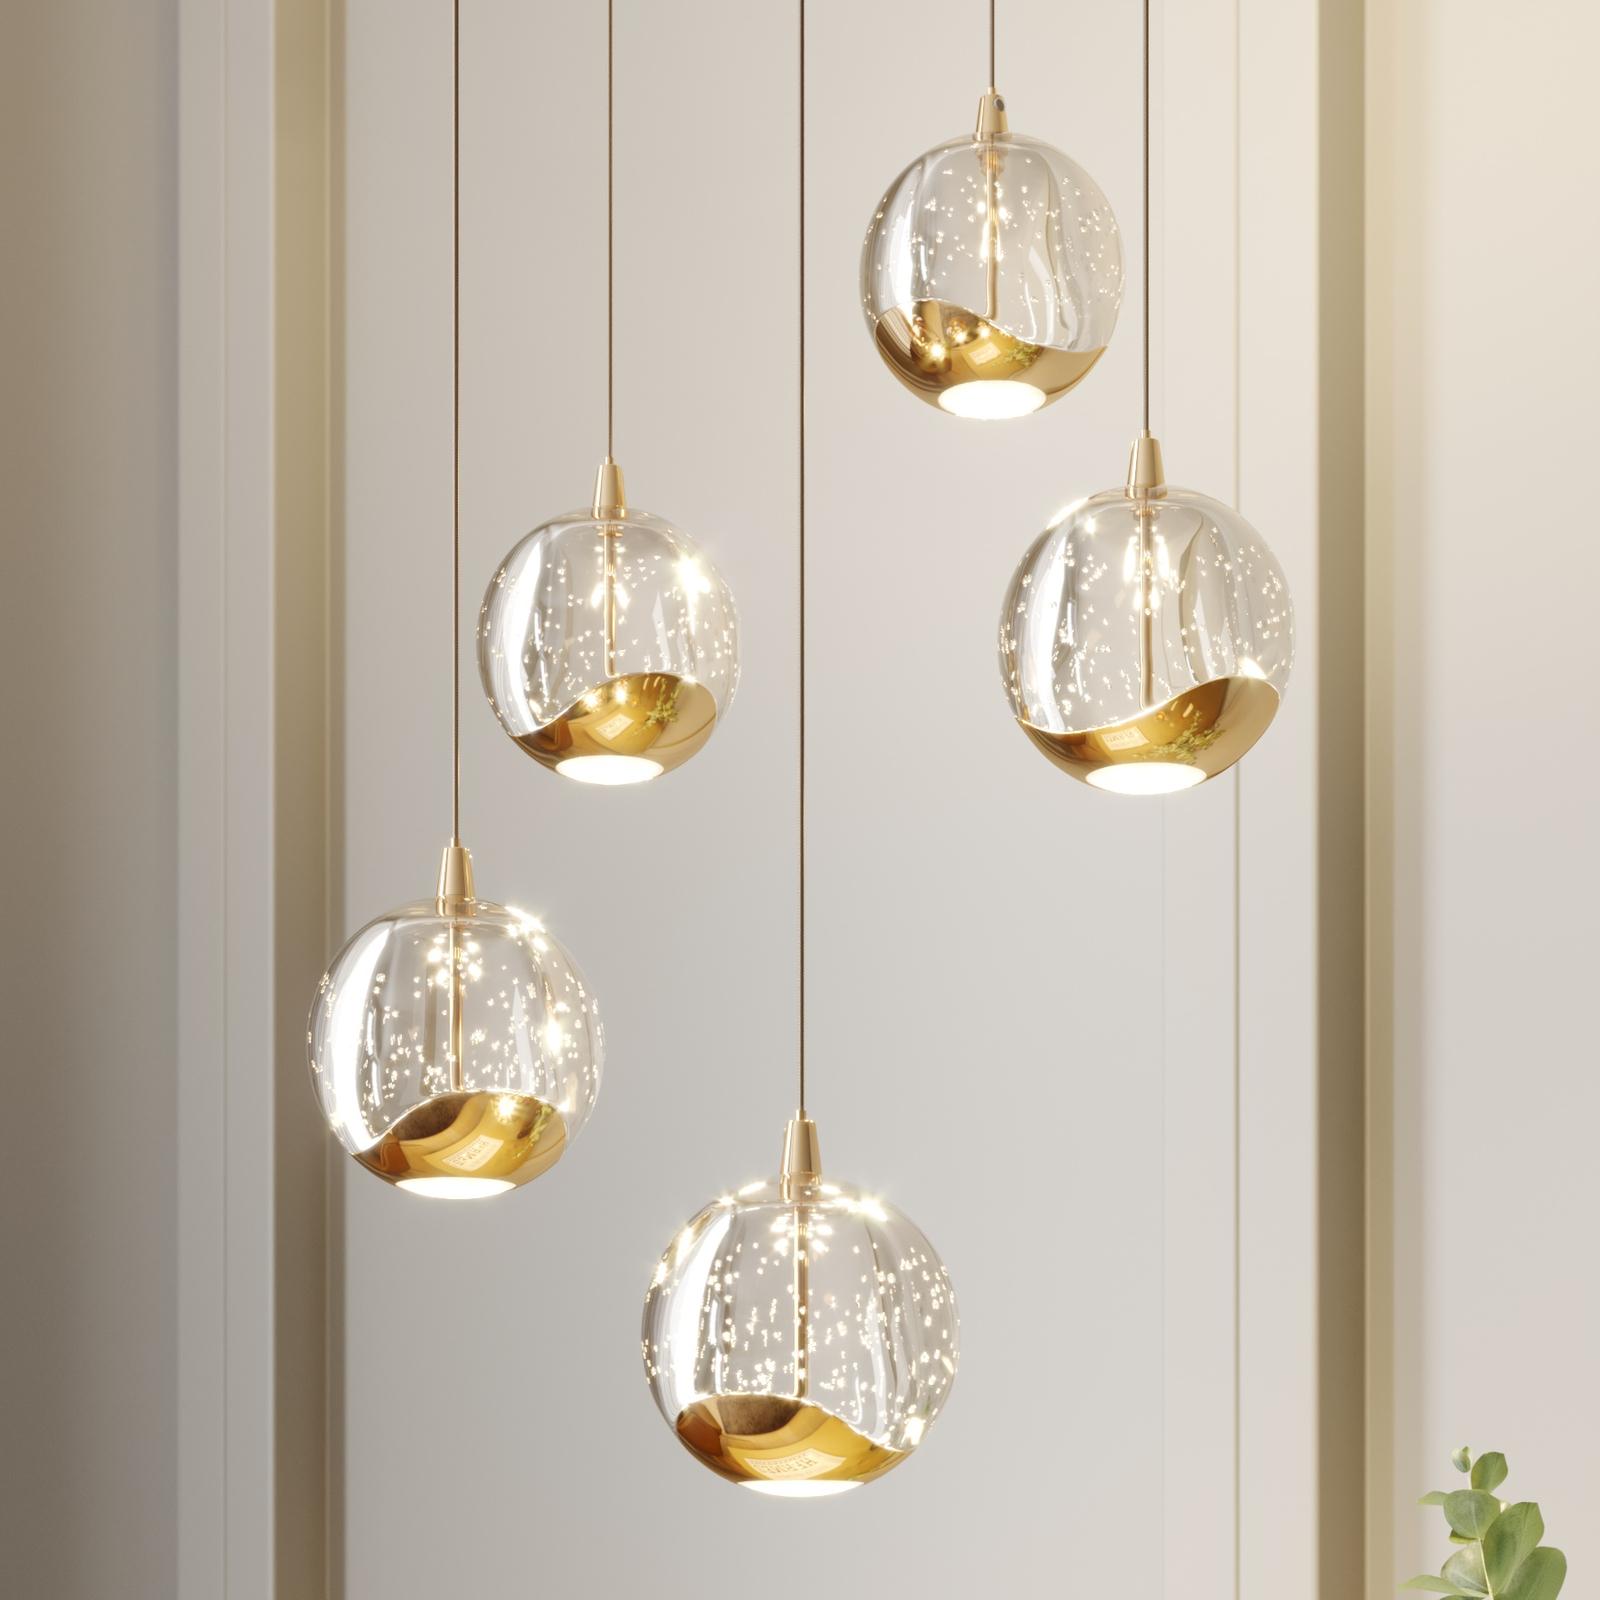 LED-pendellampe Hayley, 5 lyskilder, rund, gull